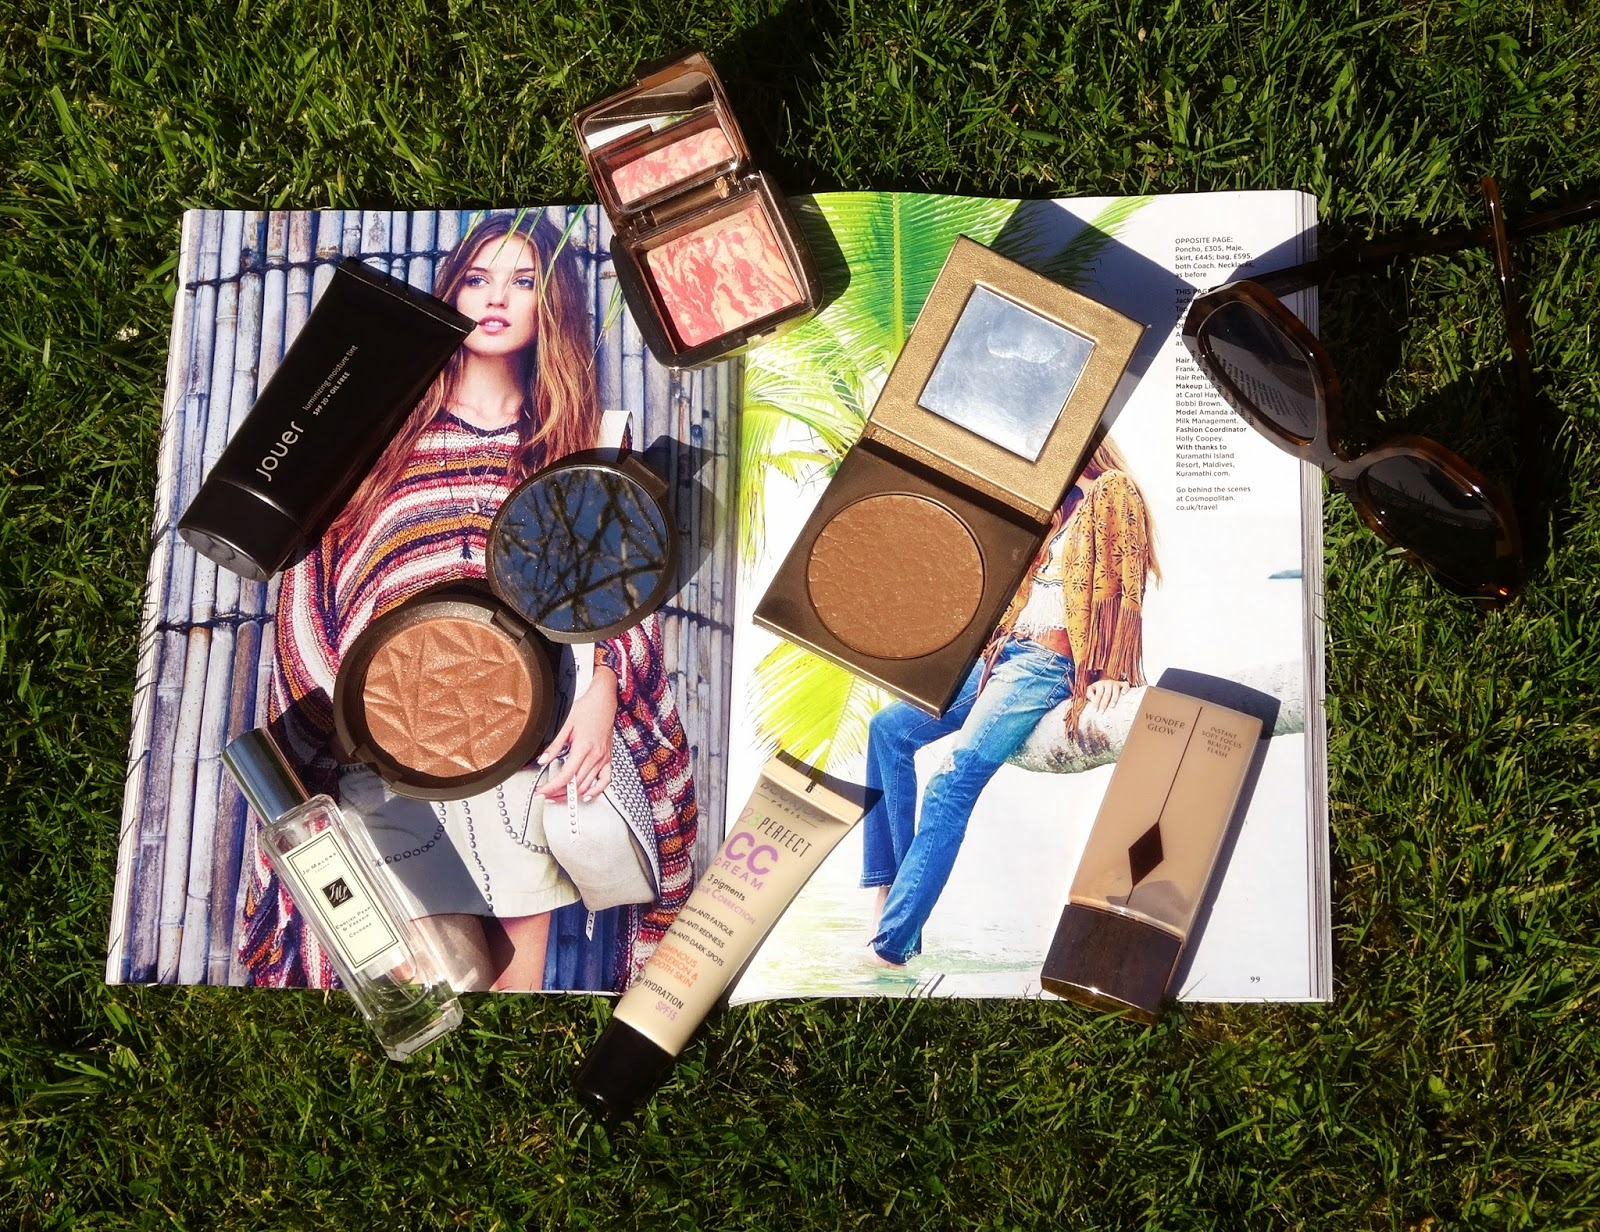 Jouer, Jo Malone, Becca Cosmetics, Bourjois, Tarte Cosmetics, Charlotte Tilbury, Hourglass